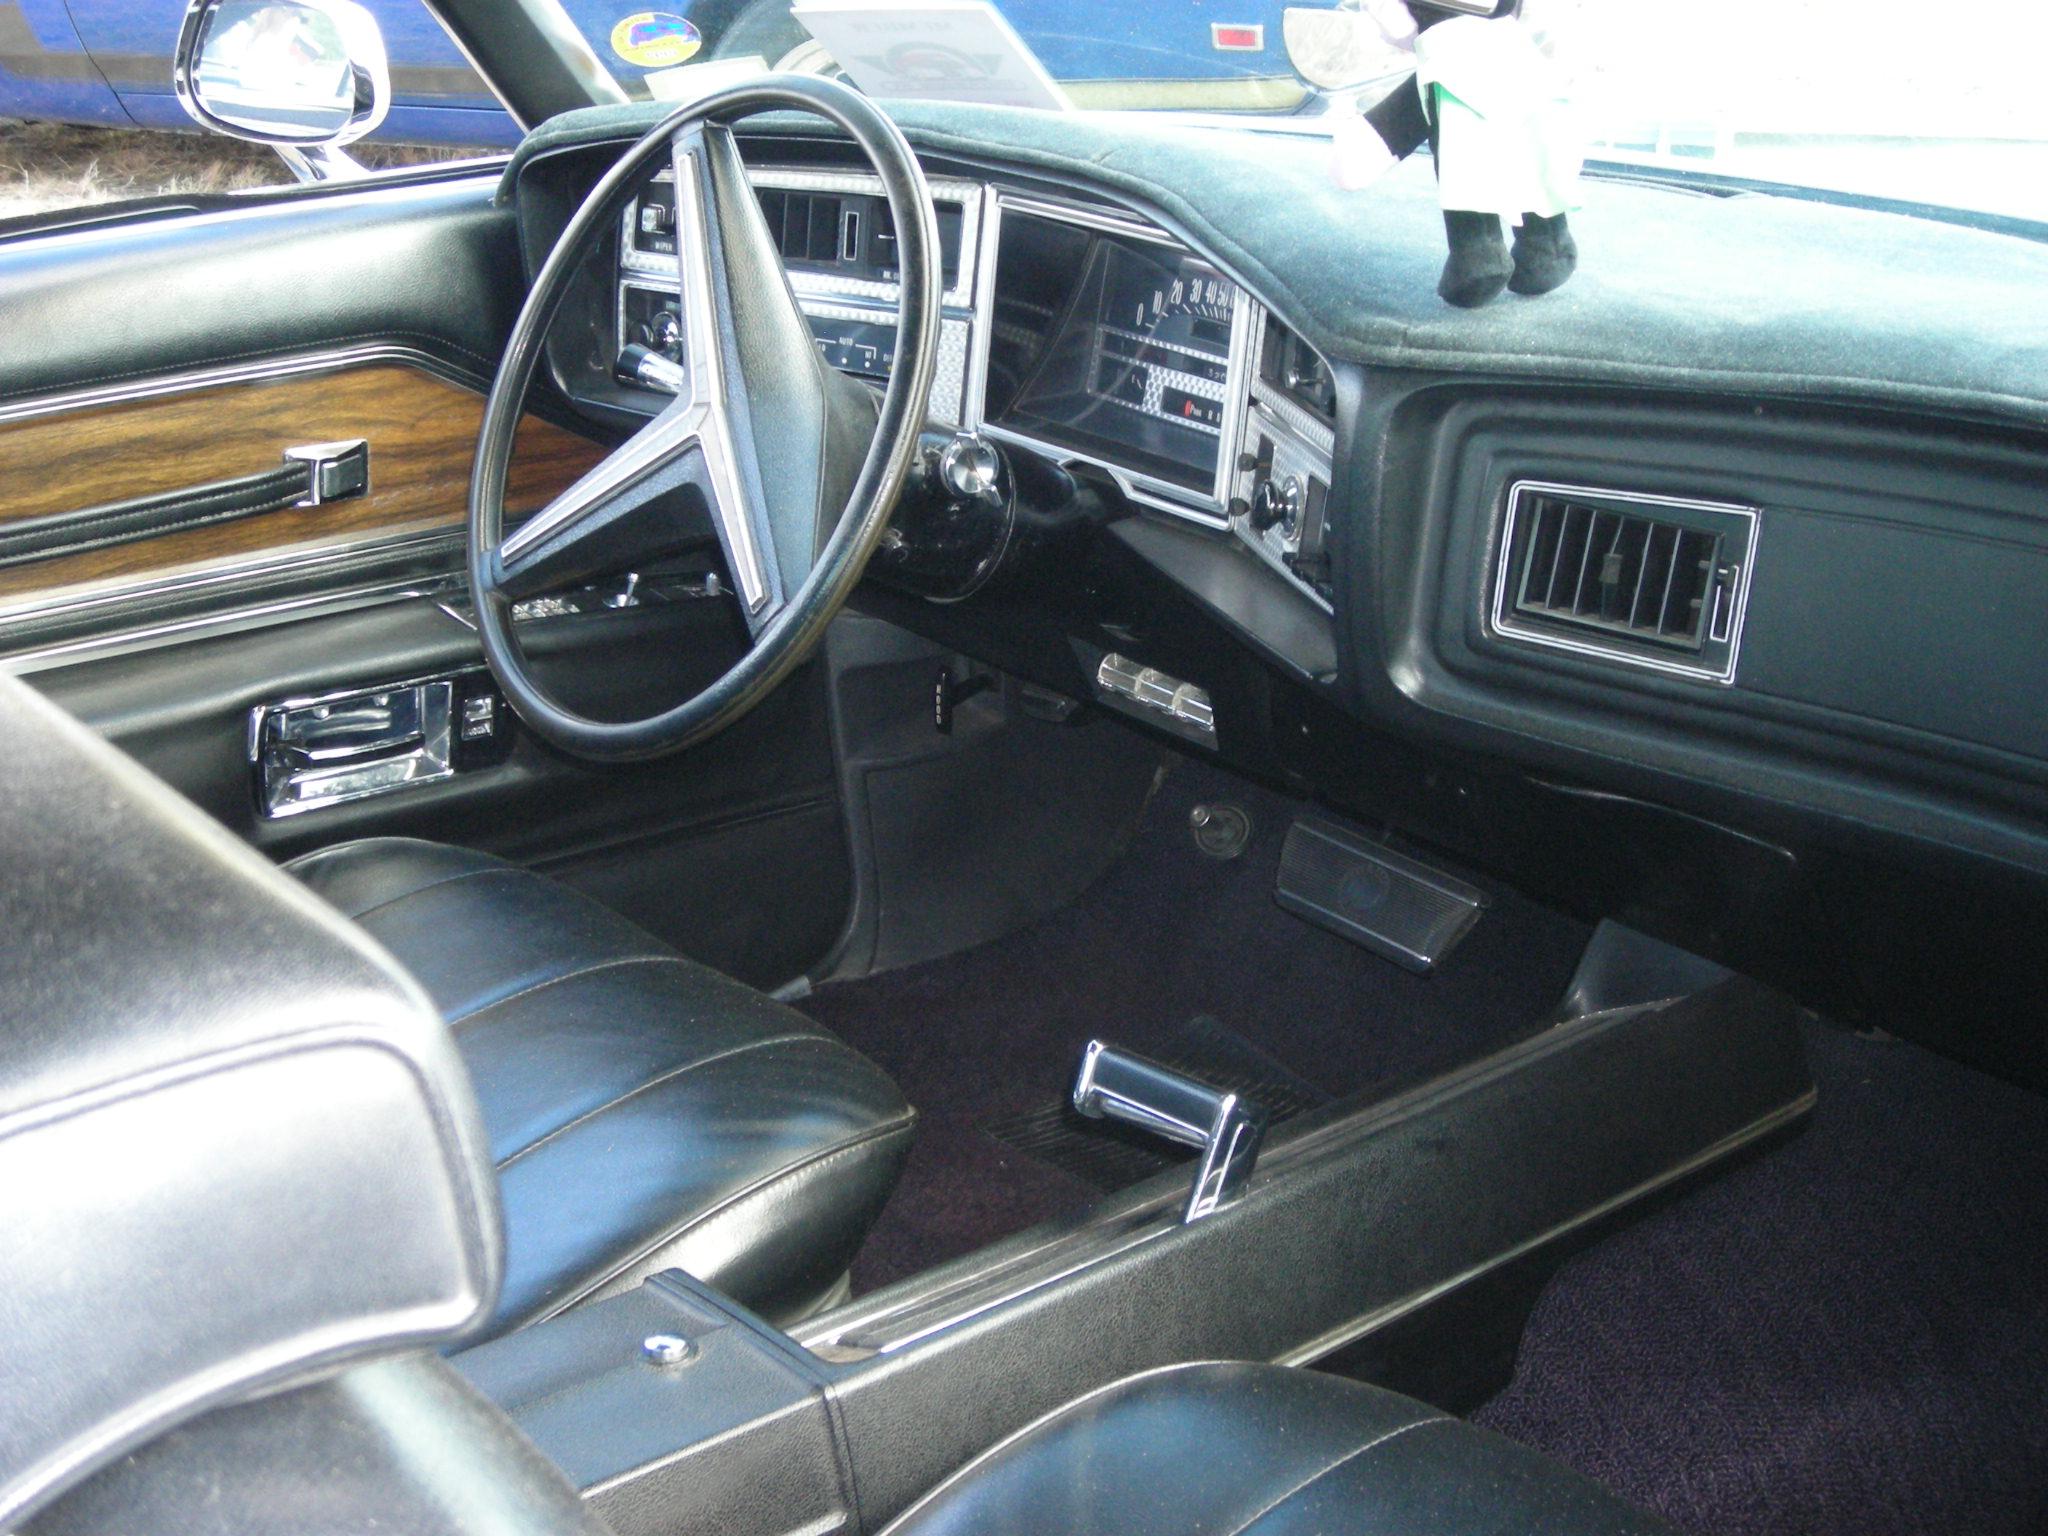 1971 Buick Riviera Interior 1971 Buick Riviera 1920 x 1080